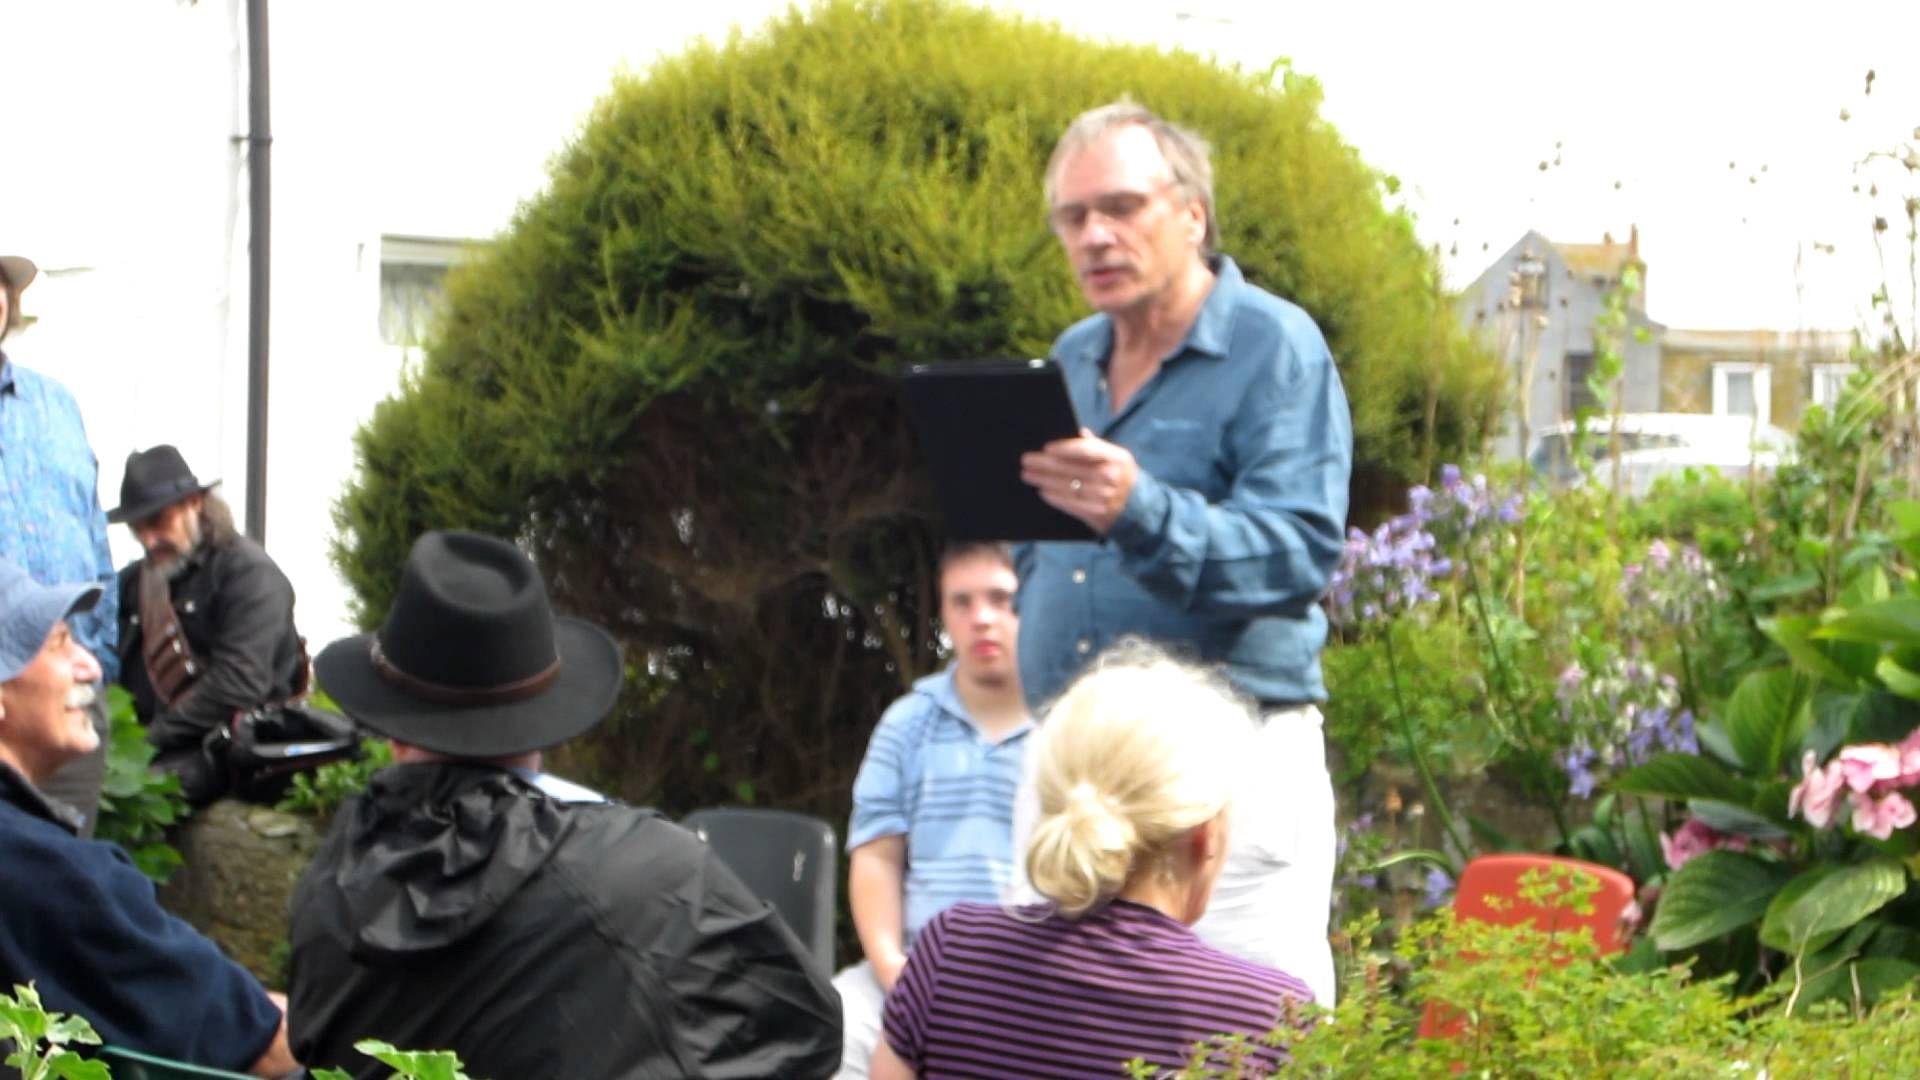 John Lavan recites a poem for his son, who he introduces